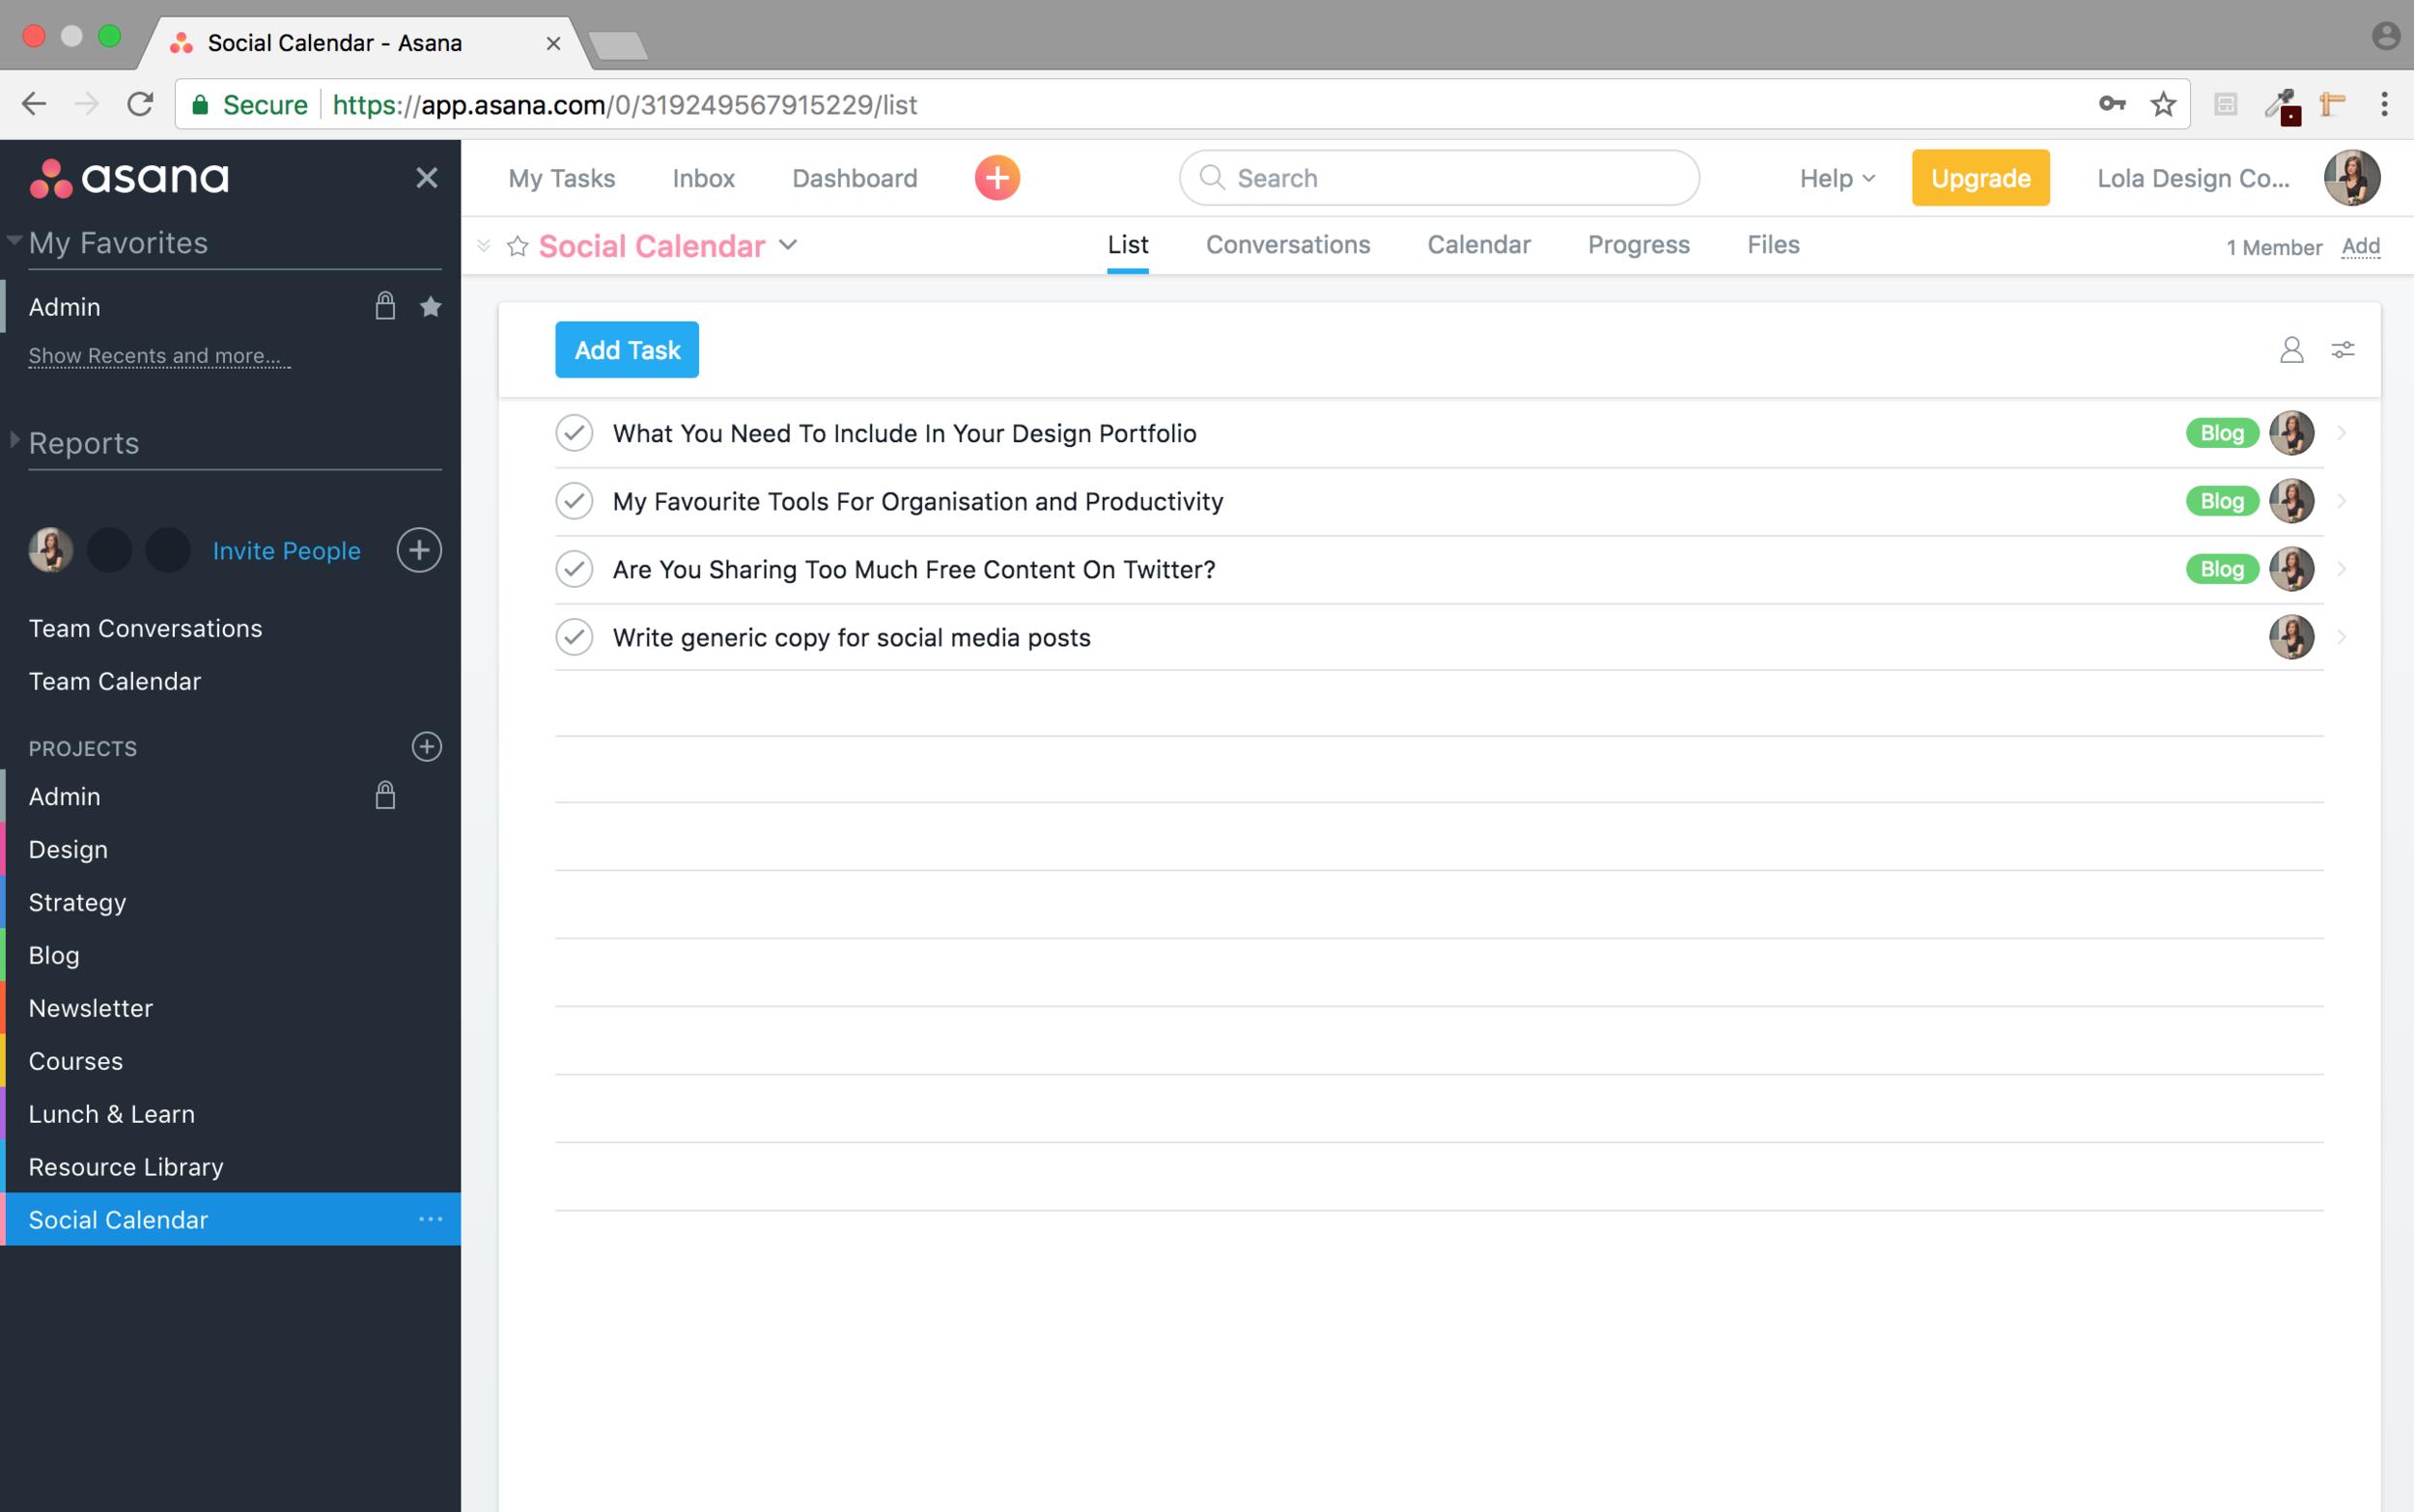 Asana-Website-Screenshot-Lola-Design-Company.png